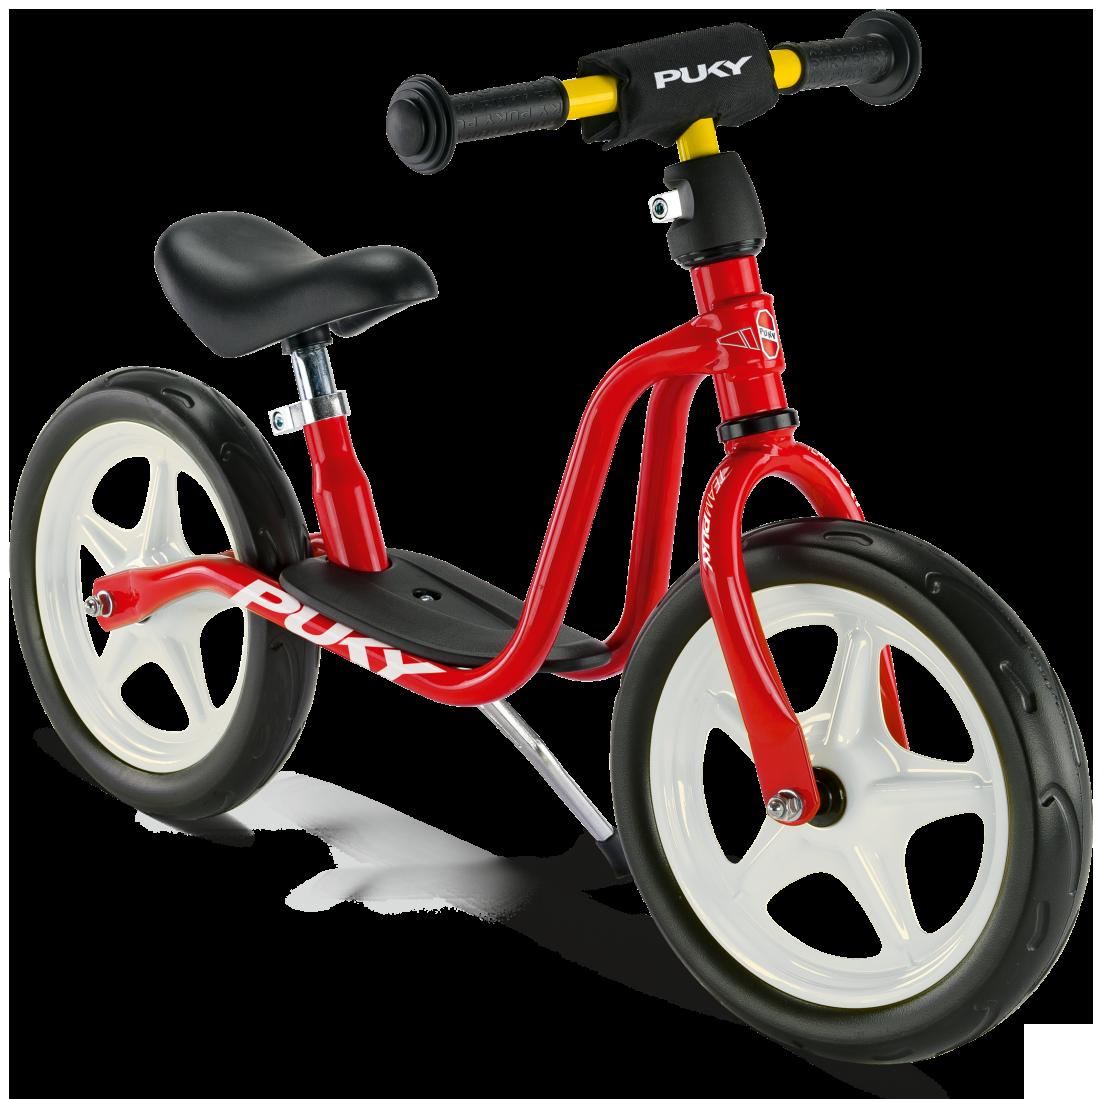 Puky LR 1 Løbecykel - Rød